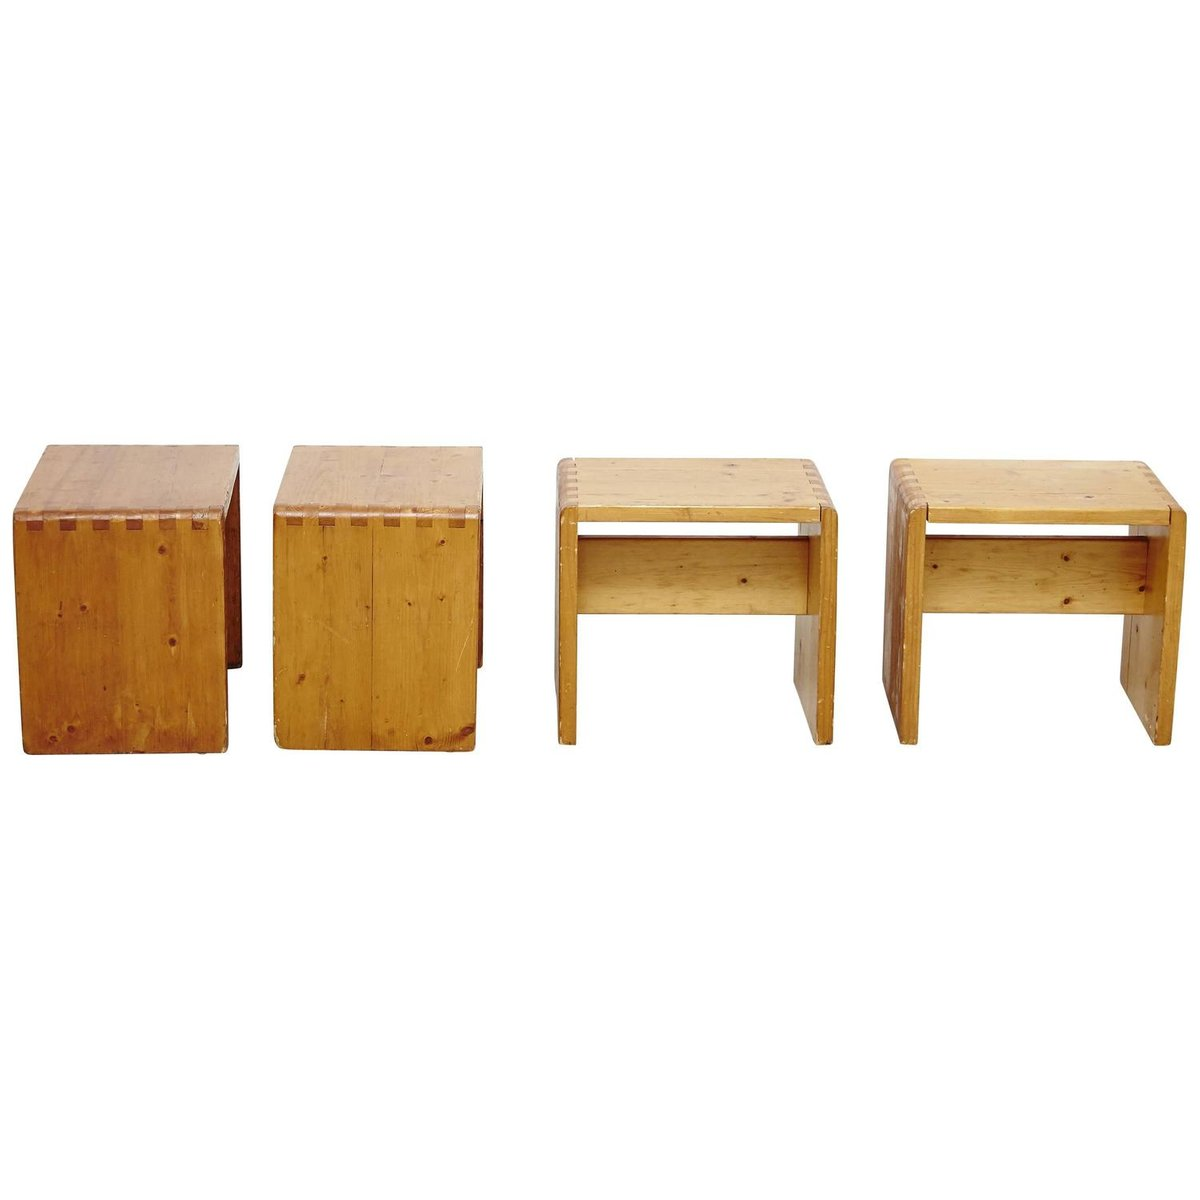 tabourets les arcs par charlotte perriand 1960s set de 4. Black Bedroom Furniture Sets. Home Design Ideas